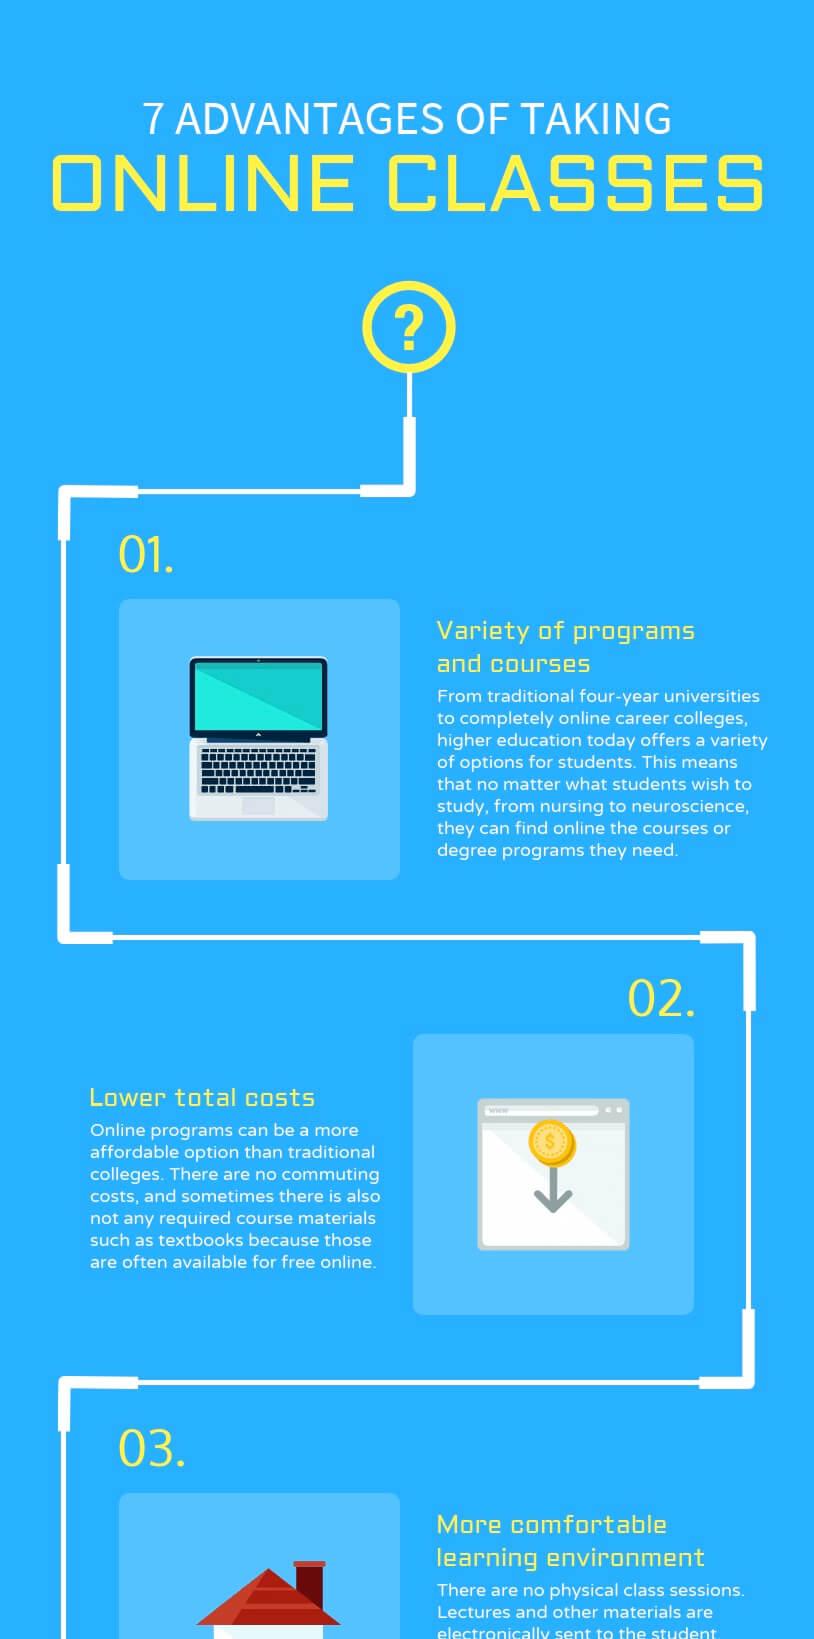 Advantages-Infographic-Template-Infographic-Design